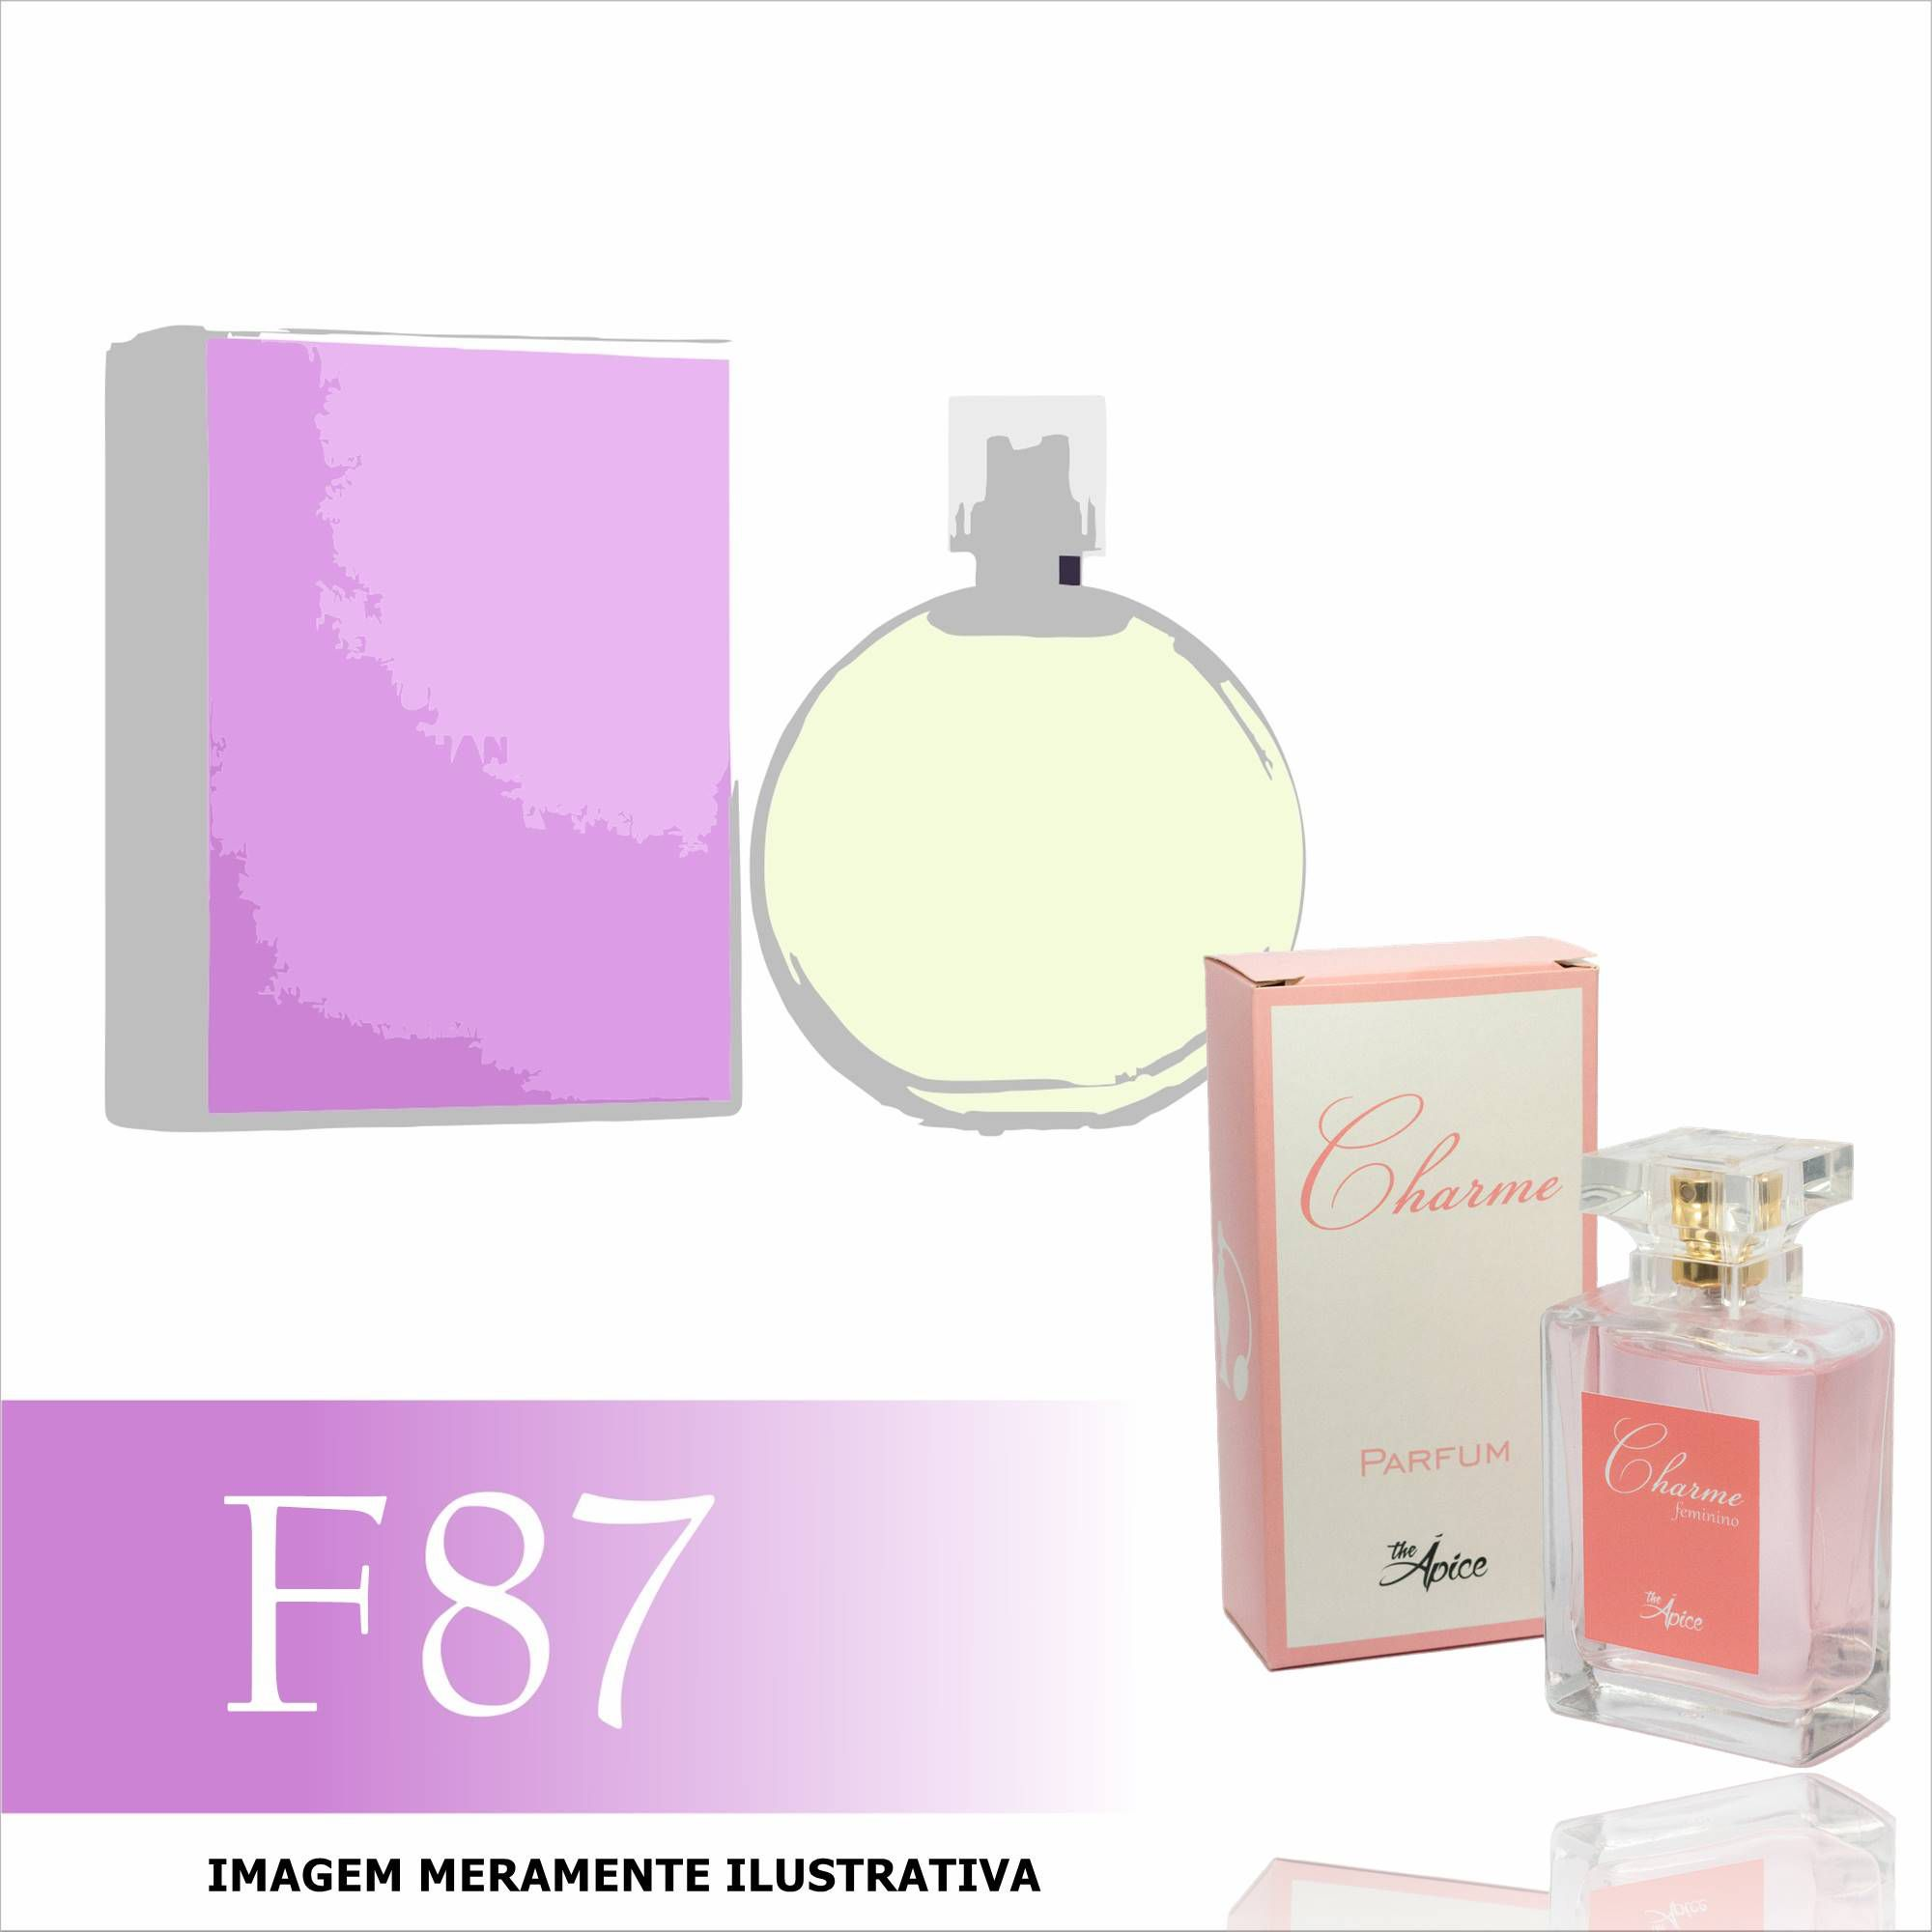 825a288e3e6 Perfume F87 Inspirado no Chance Eau Fraiche da Chanel Feminino